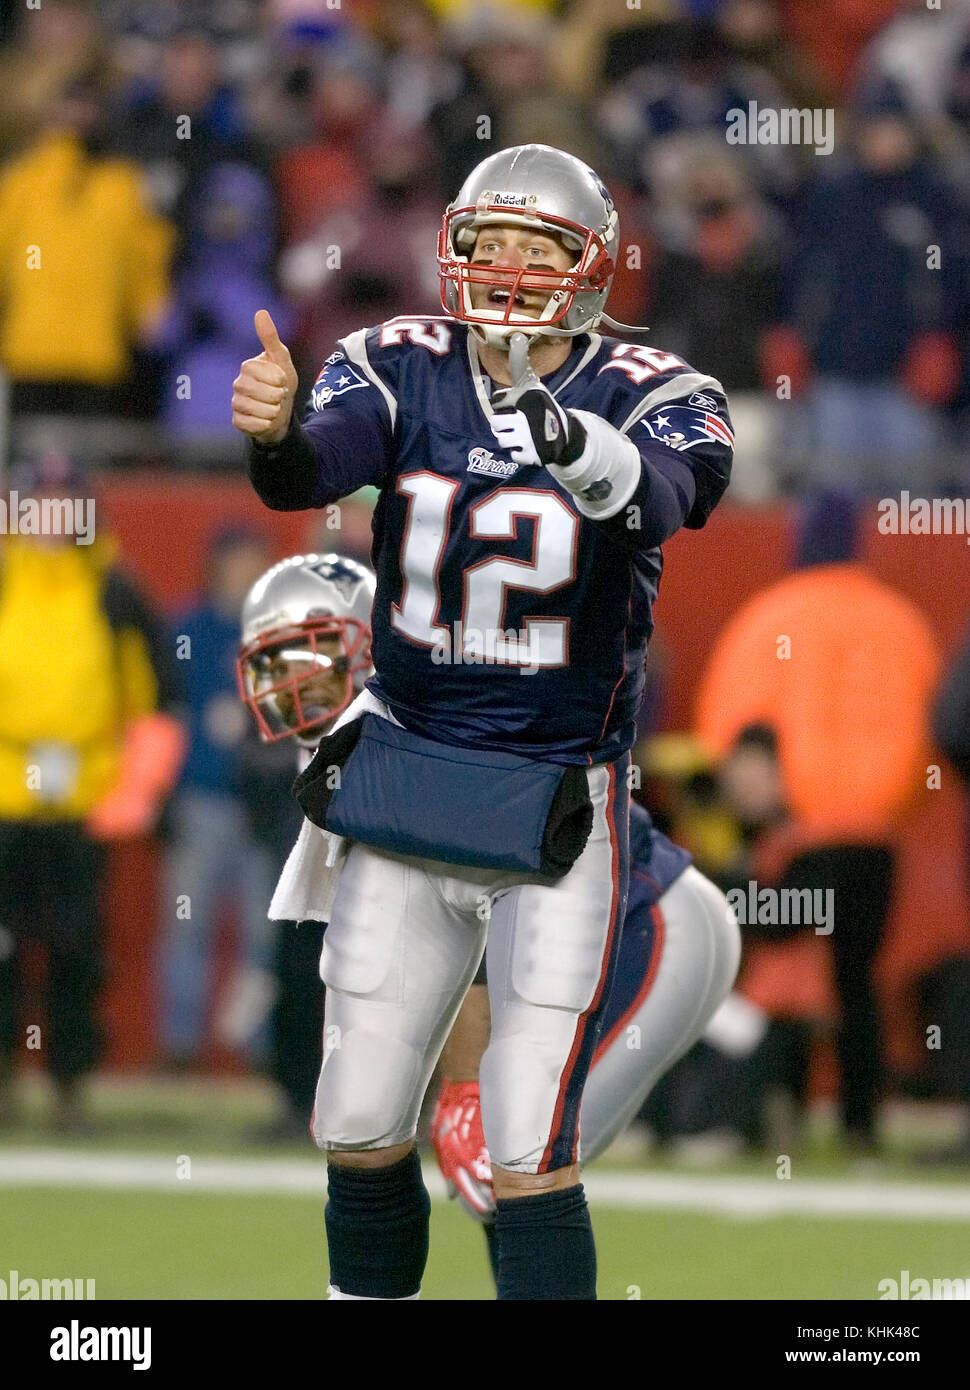 New England Patriot Quarterback Tom Brady (12) signals in the fourth quarter.   Foxboro, MA, USA - Stock Image